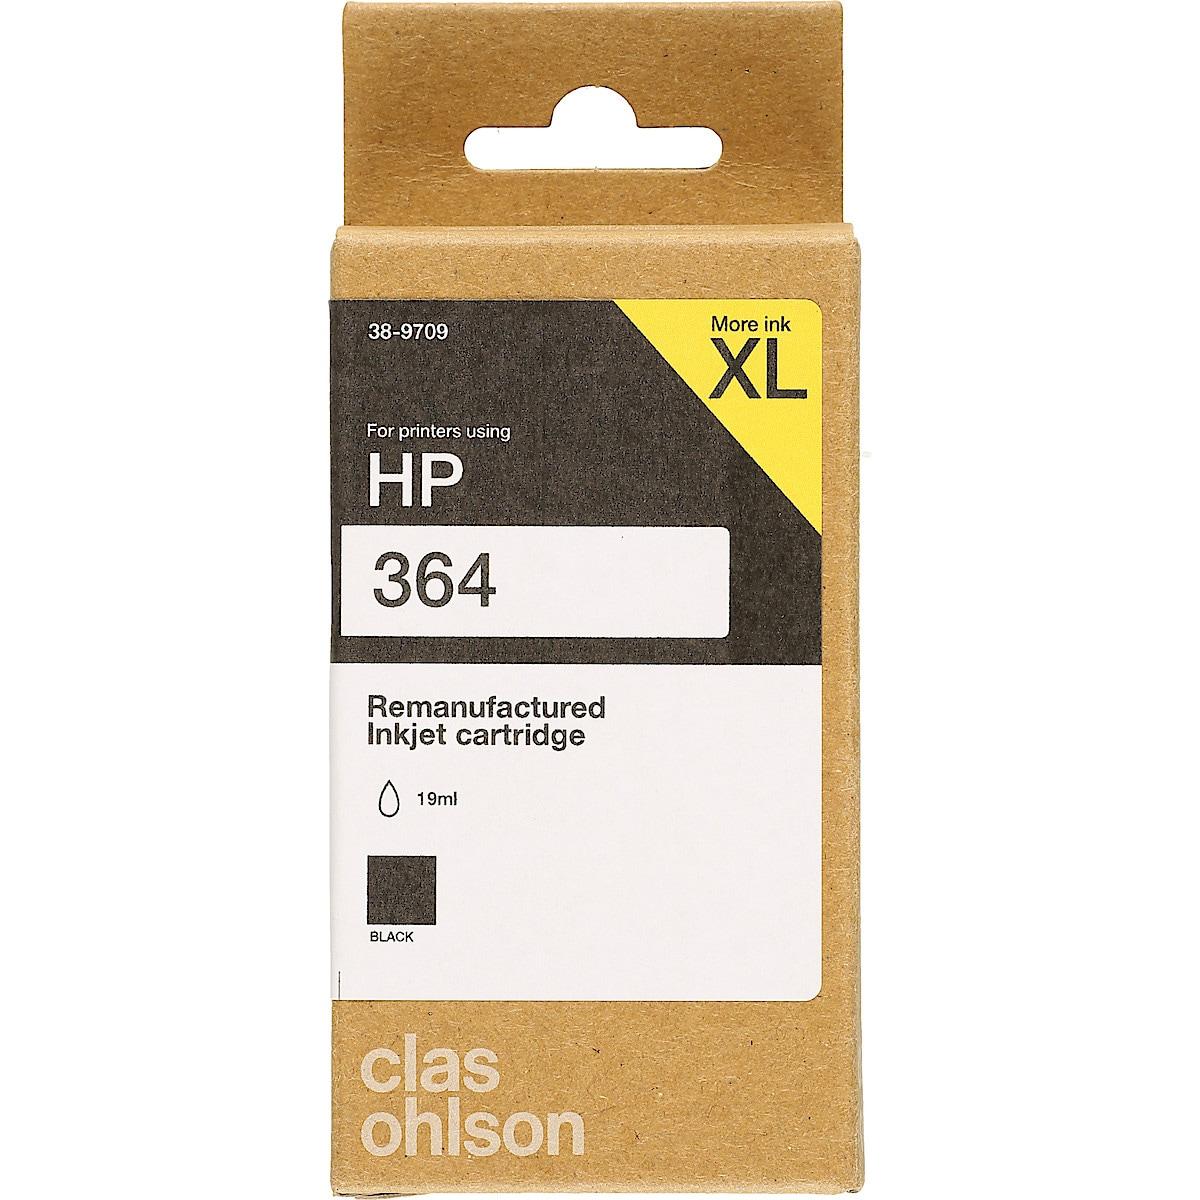 HP 364 bläckpatron XL, Clas Ohlson